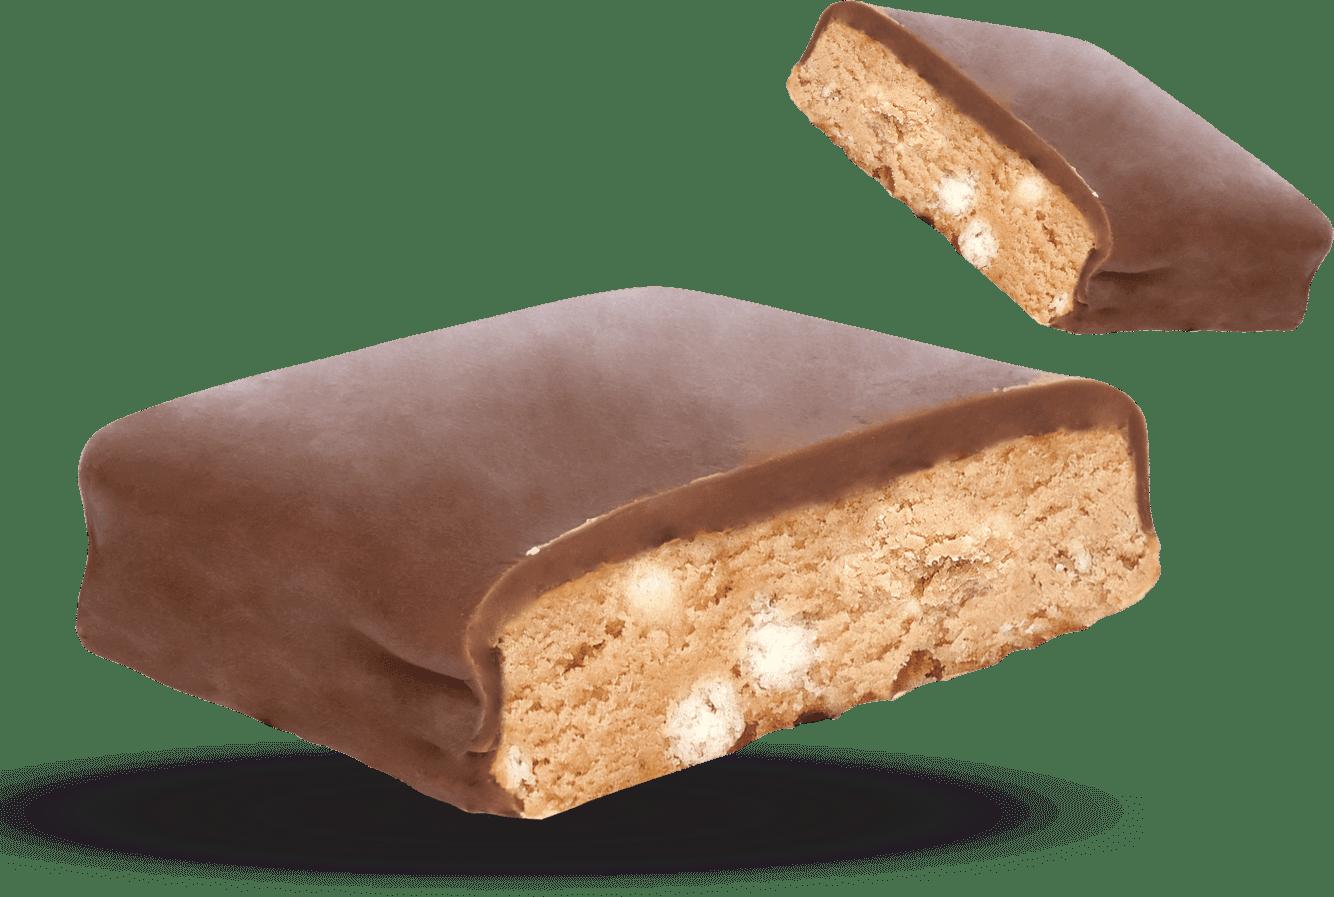 Redcon1 Bar Peanut Butter Inside